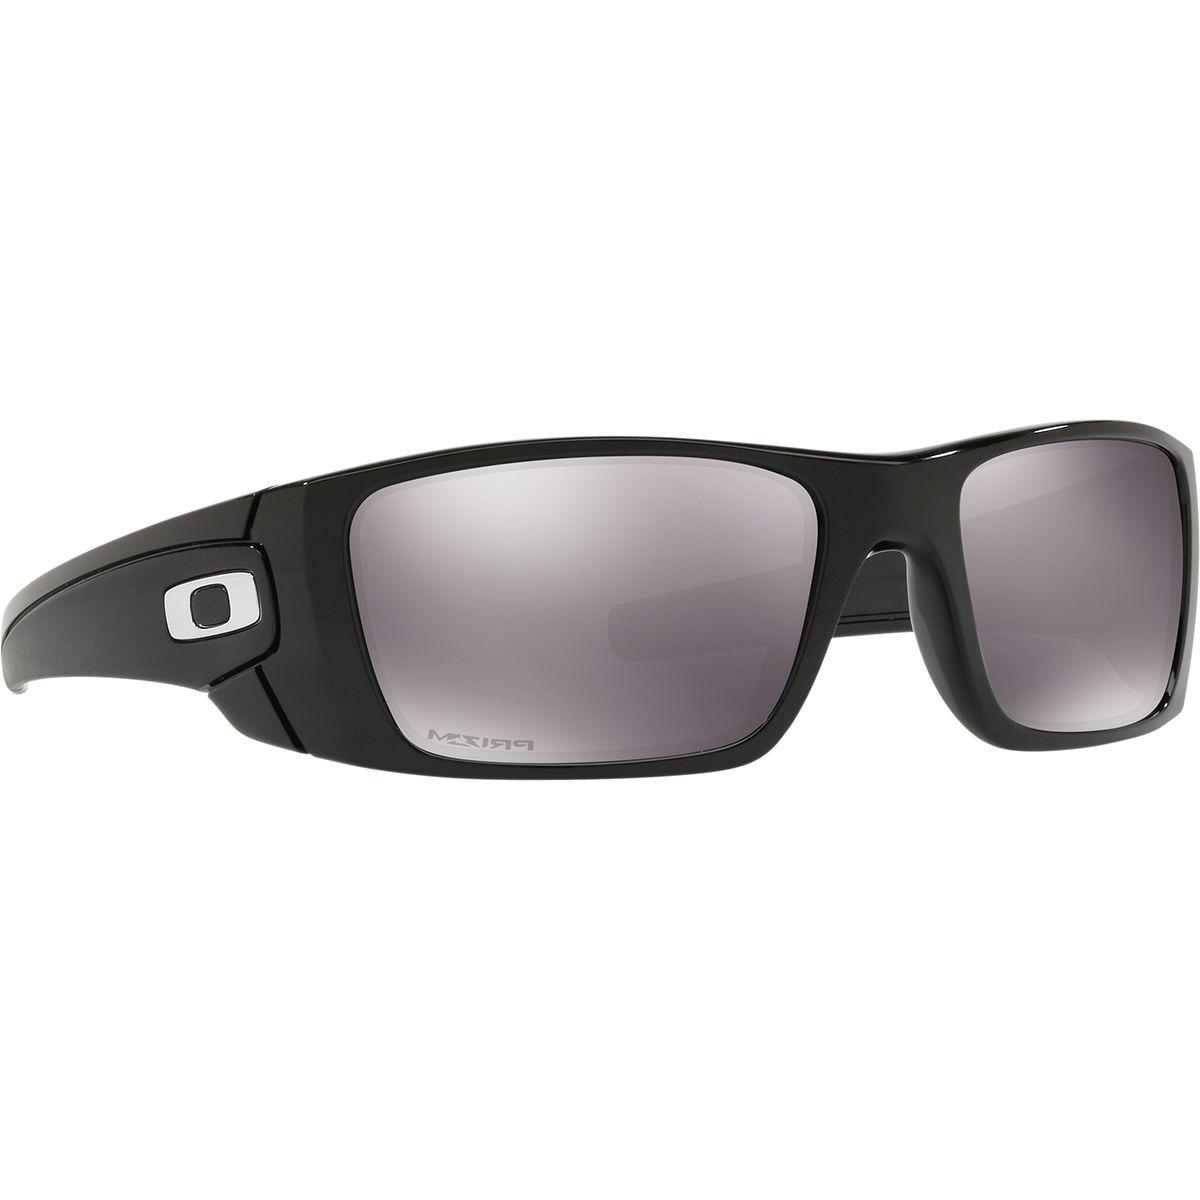 Oakley Fuel Cell Prizm Sunglasses - Men's